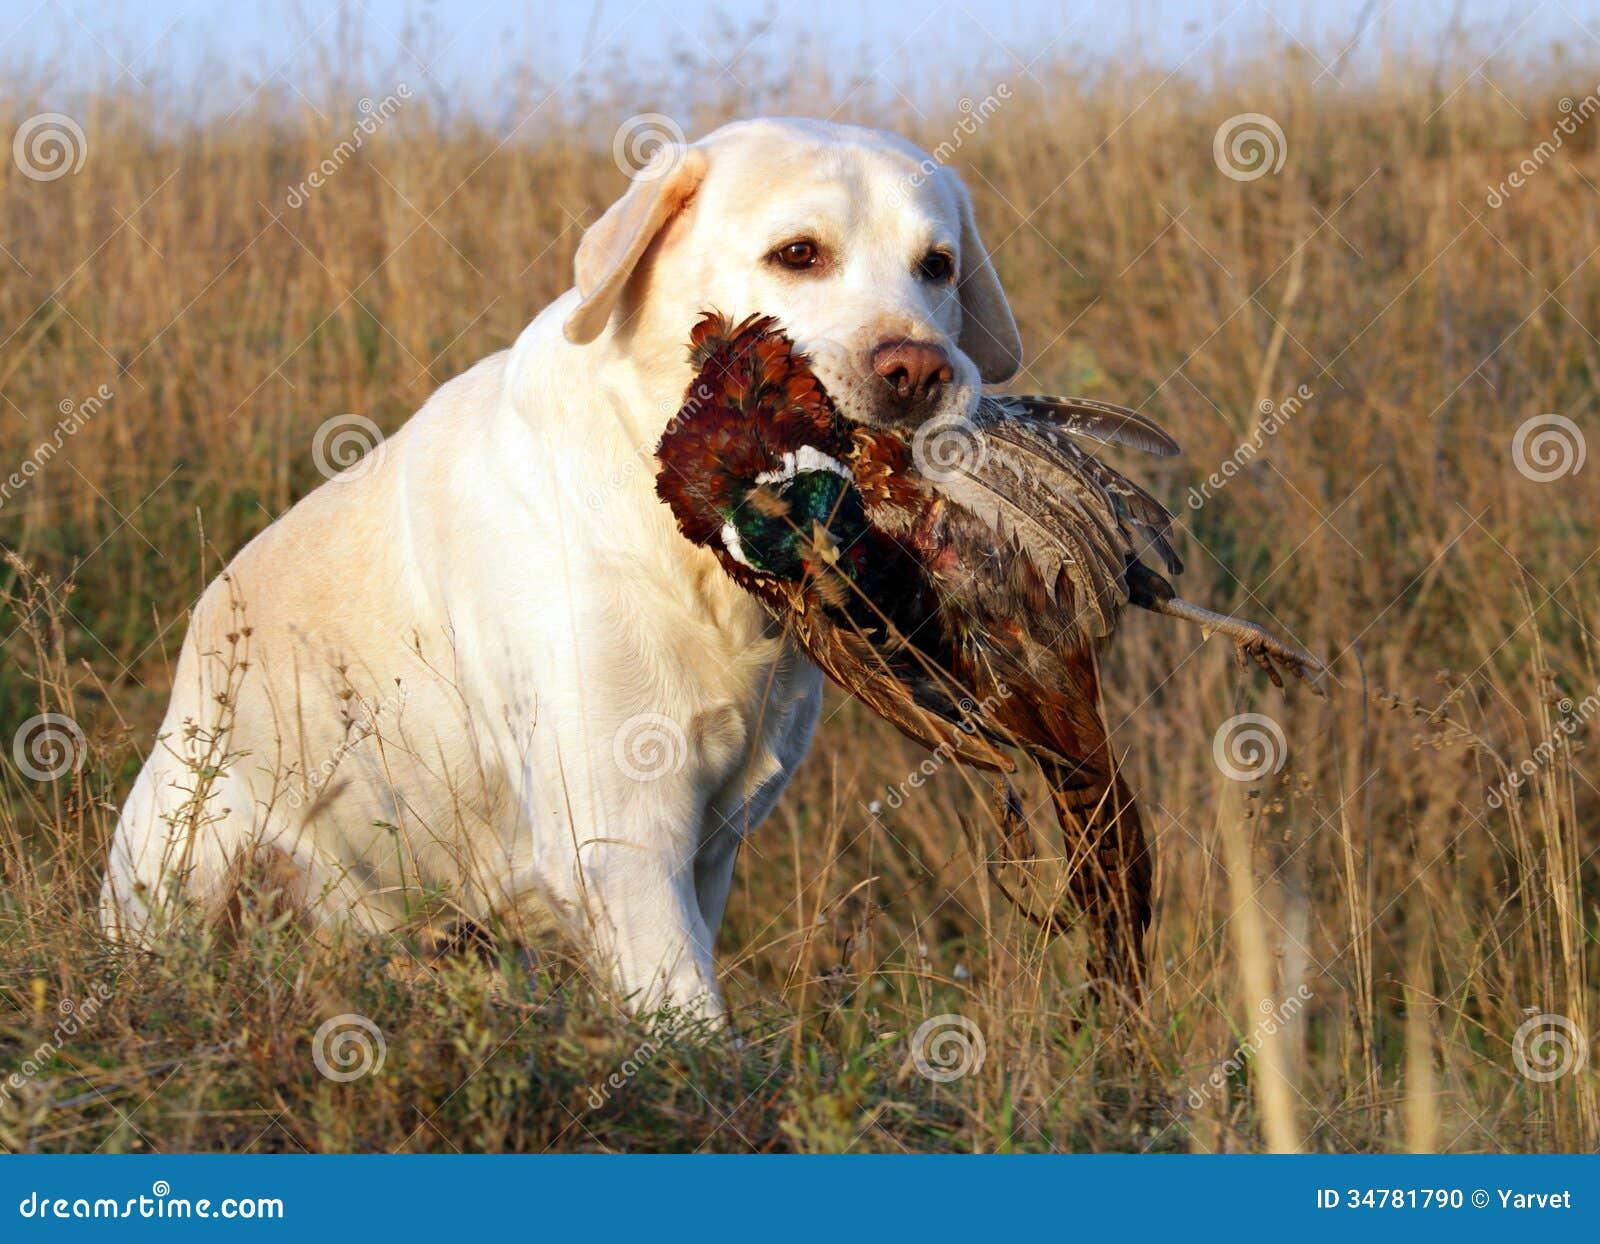 Portrait Of Yellow Labrador With Pheasant Stock Photo ...  Portrait Of Yel...